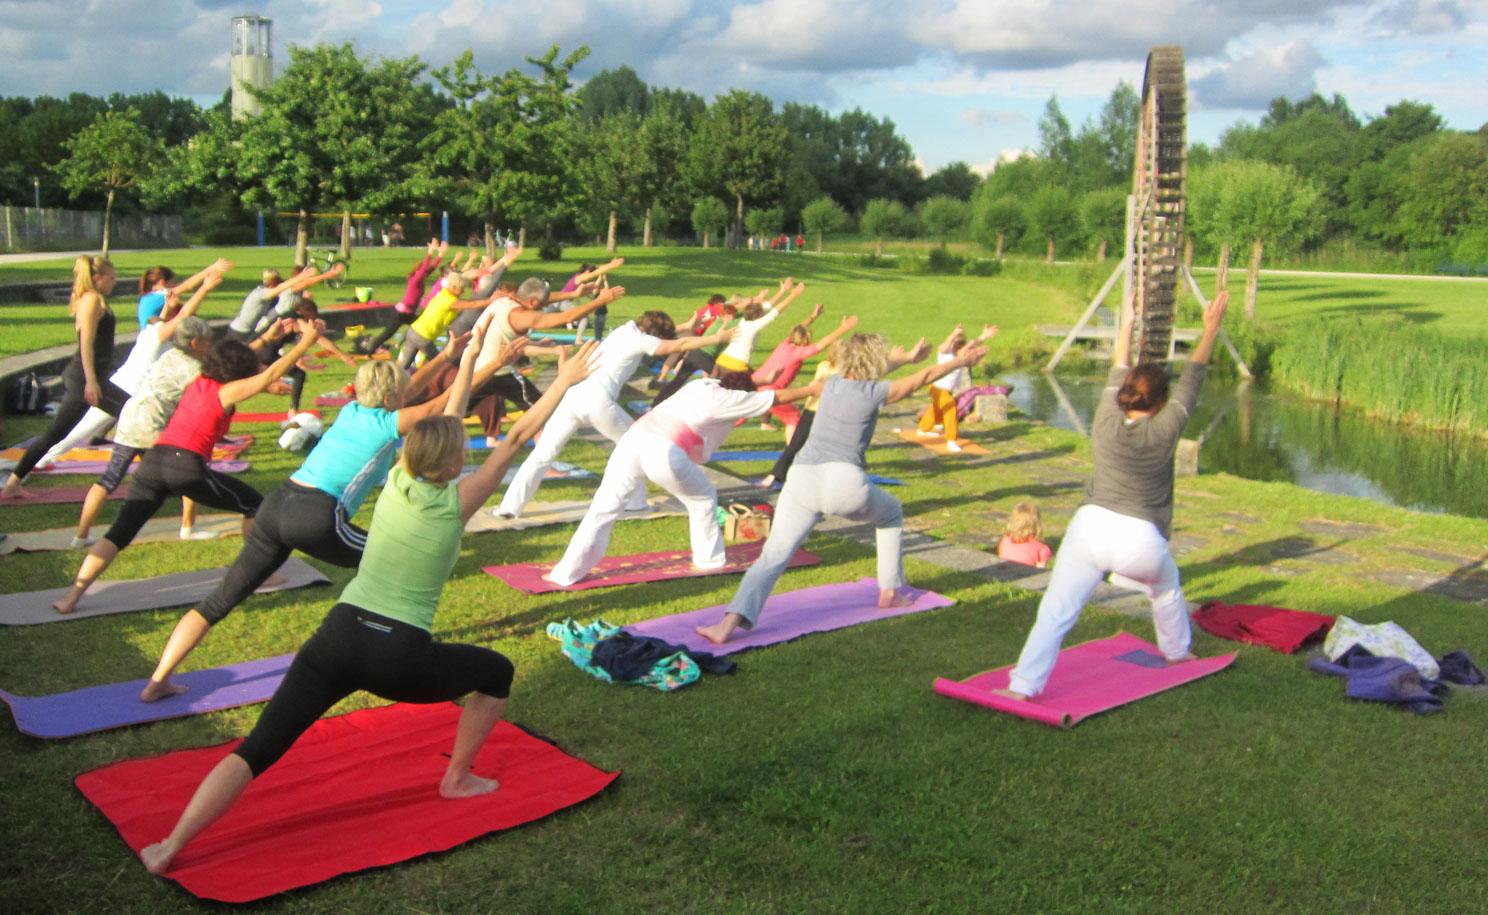 Janina Gradl Yoga und Lomi-Massage Internationaler Yogatag 2016 LGS Amberg